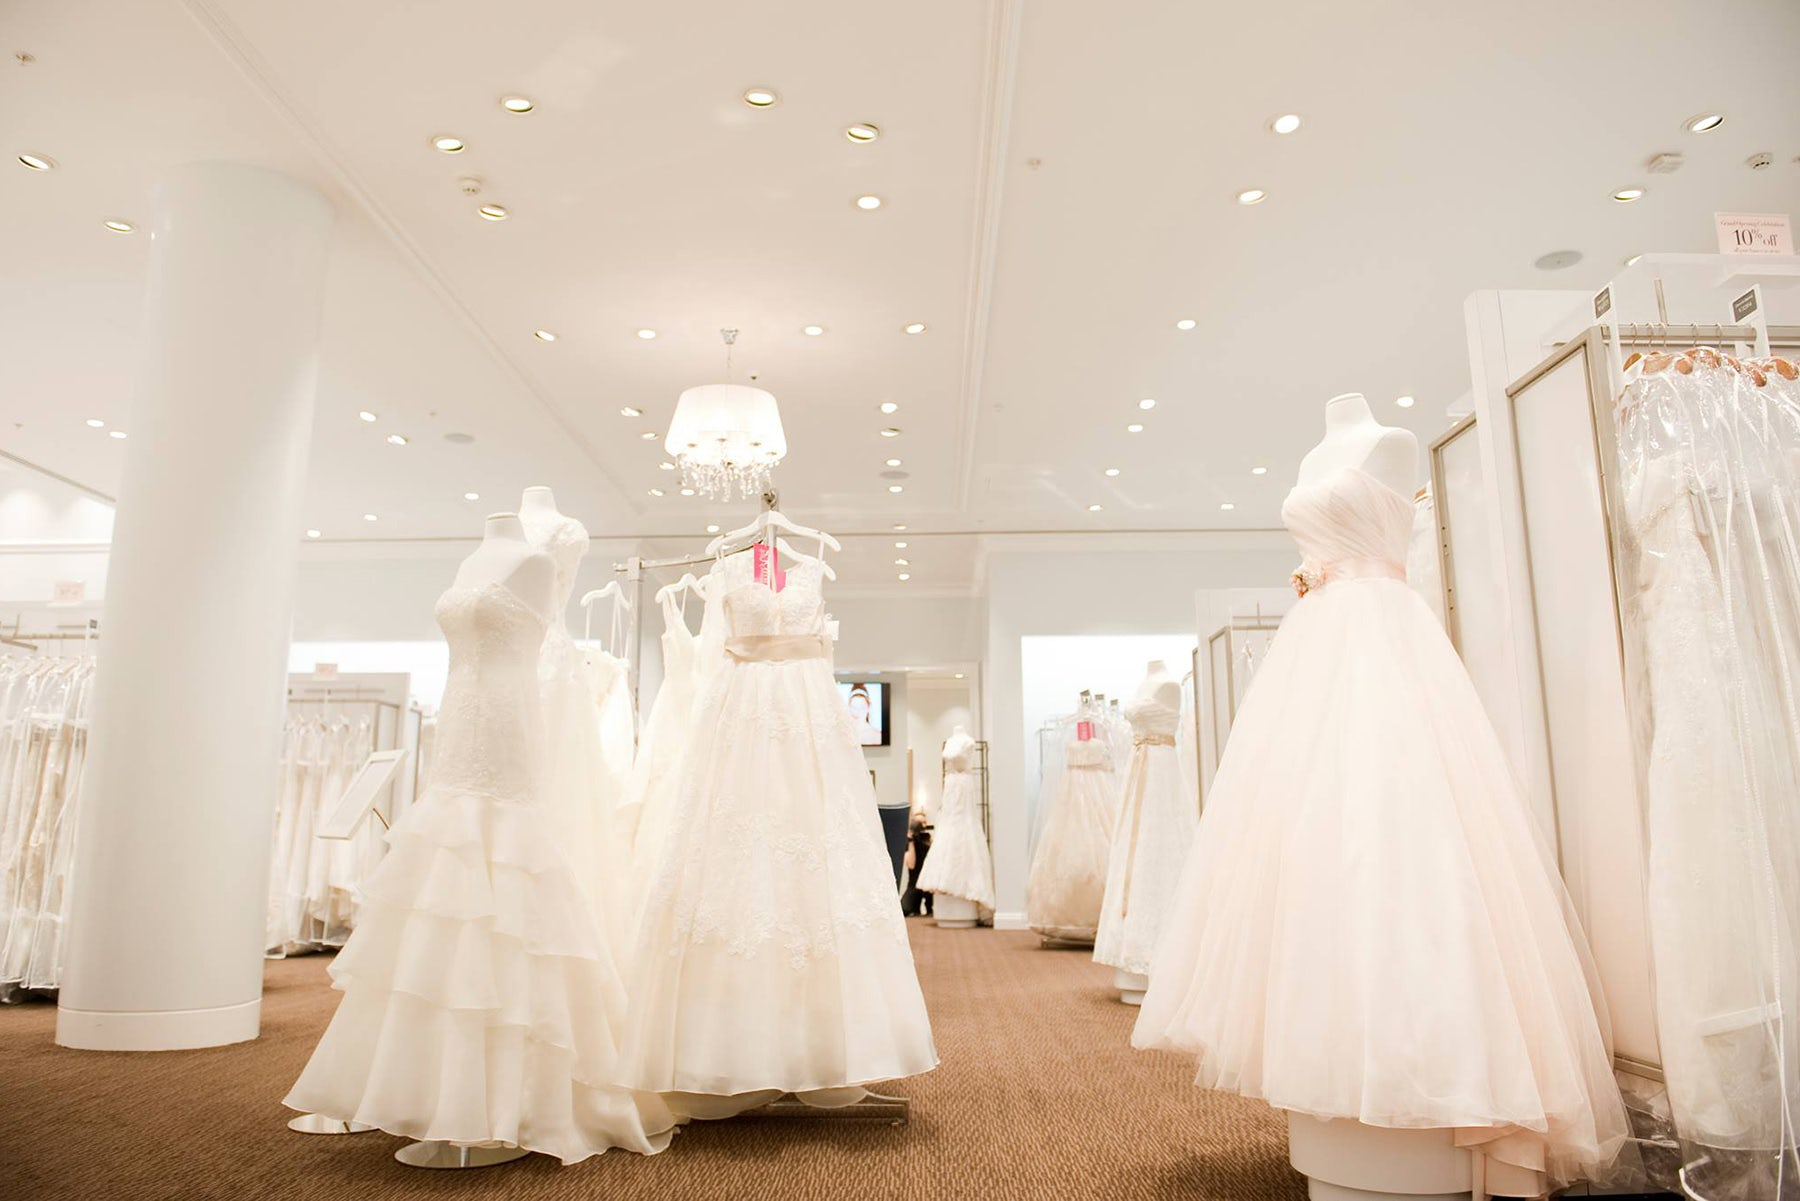 David's Bridal store | Source: David's Bridal